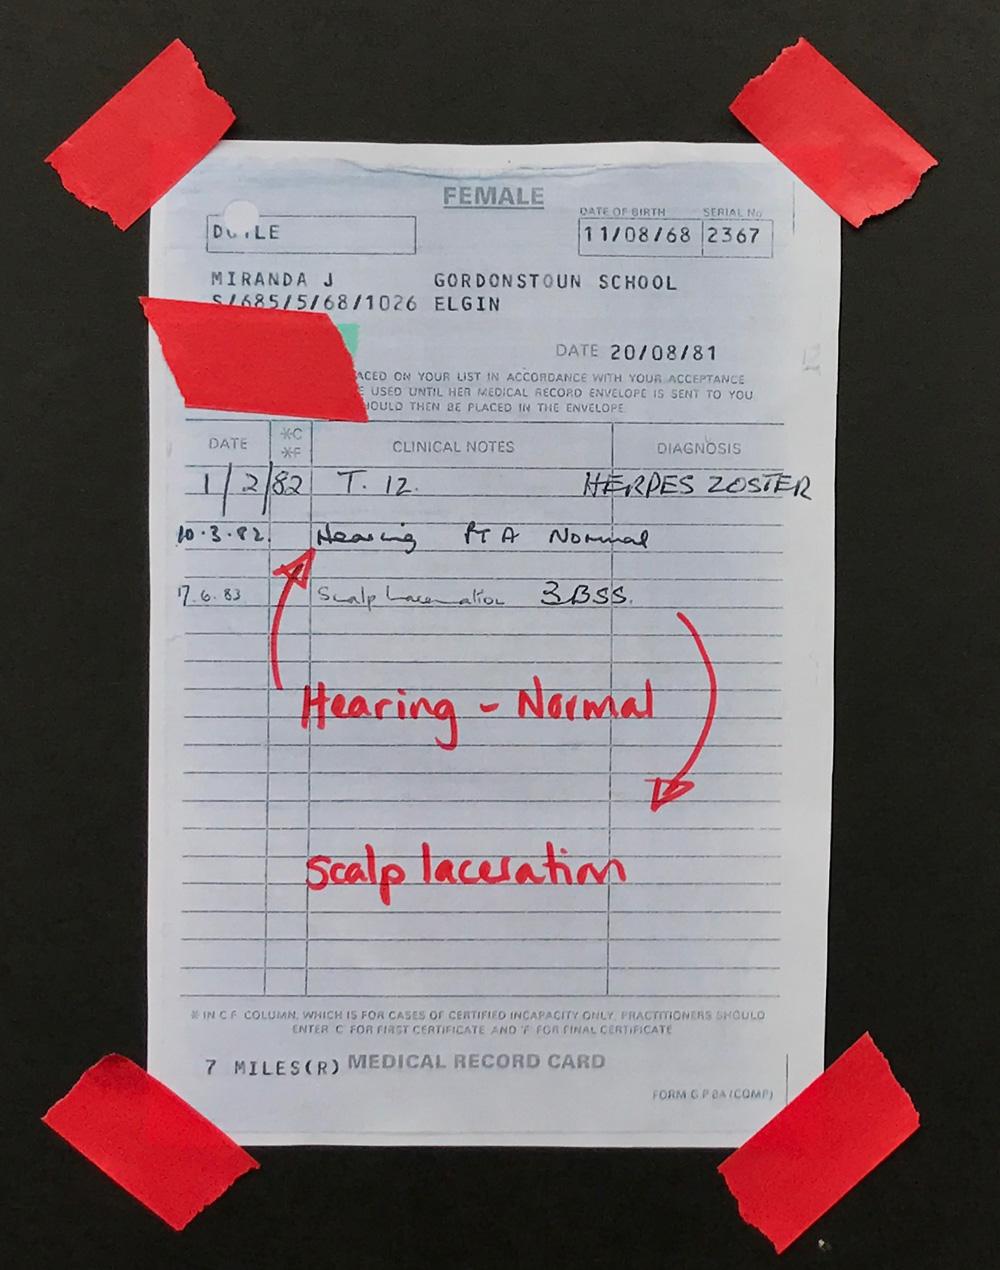 Miranda's medical records